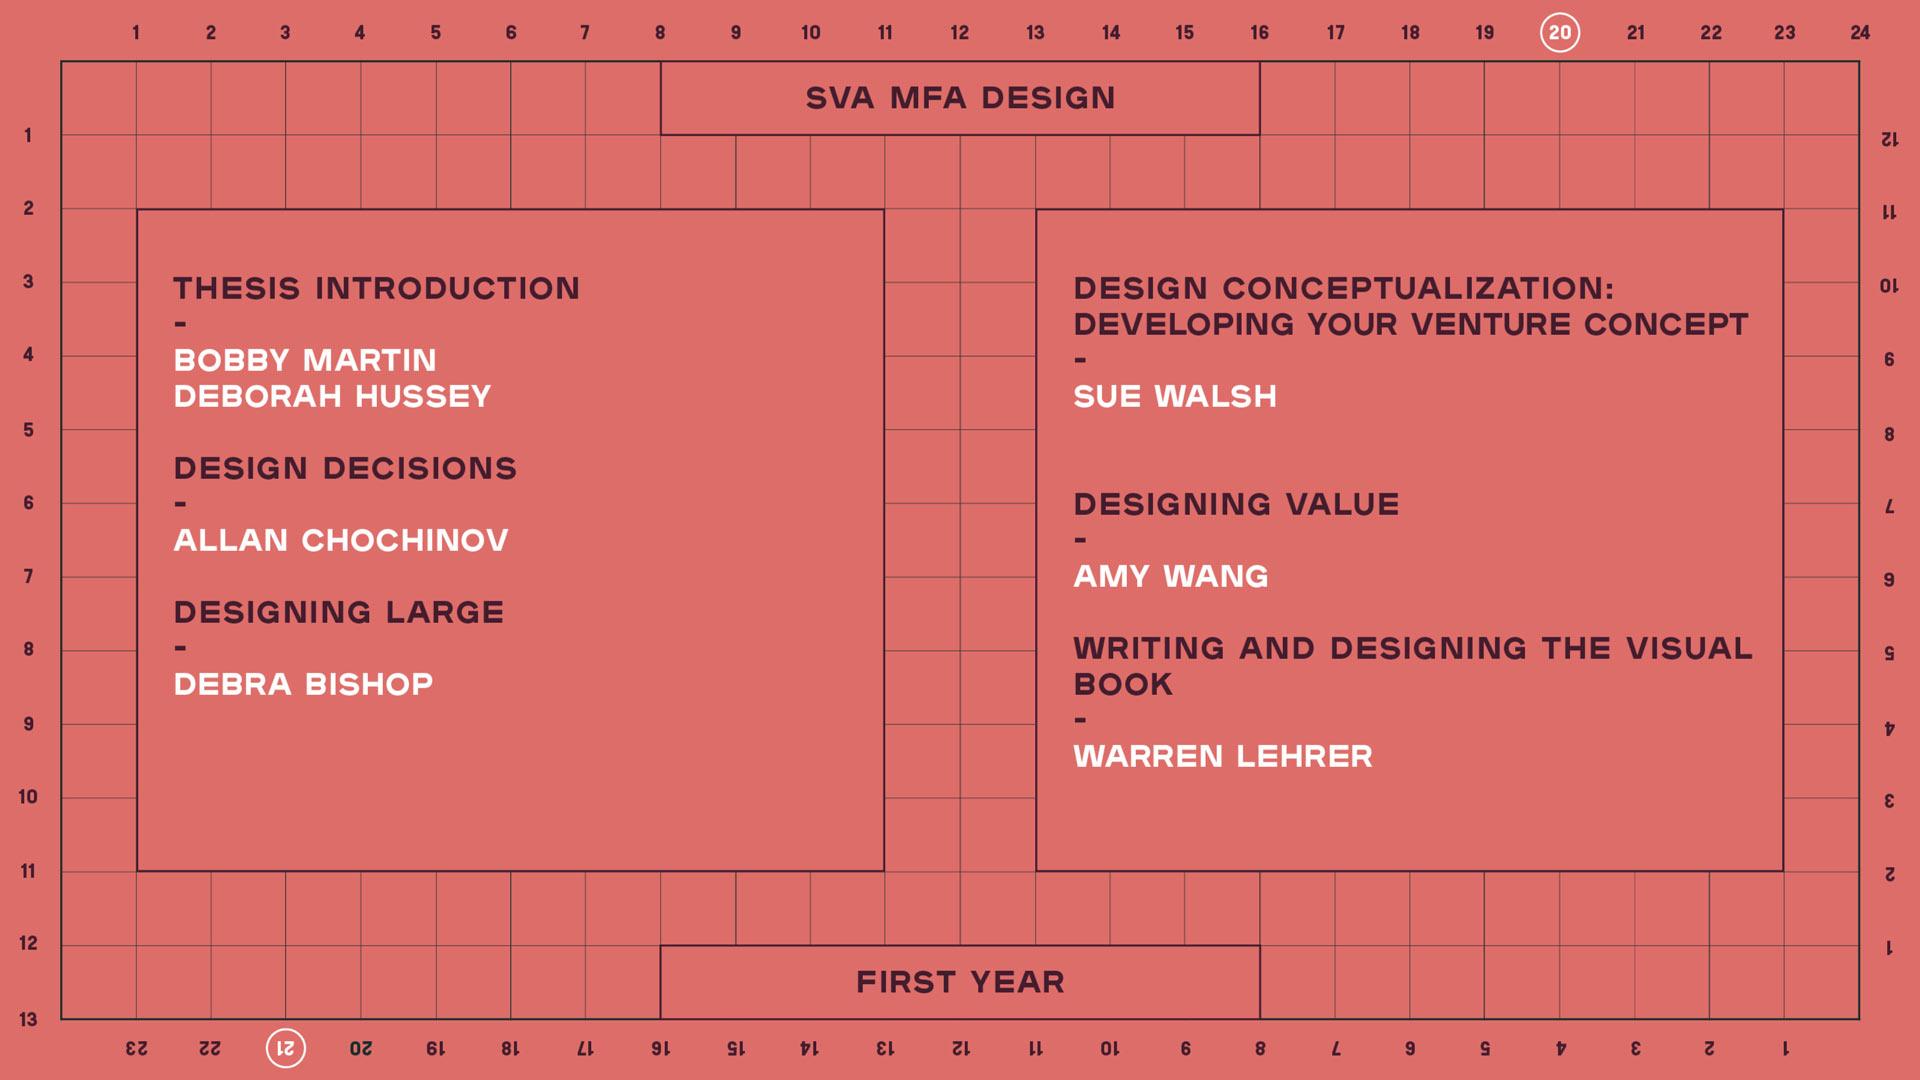 spring 2021 mfa design schedule